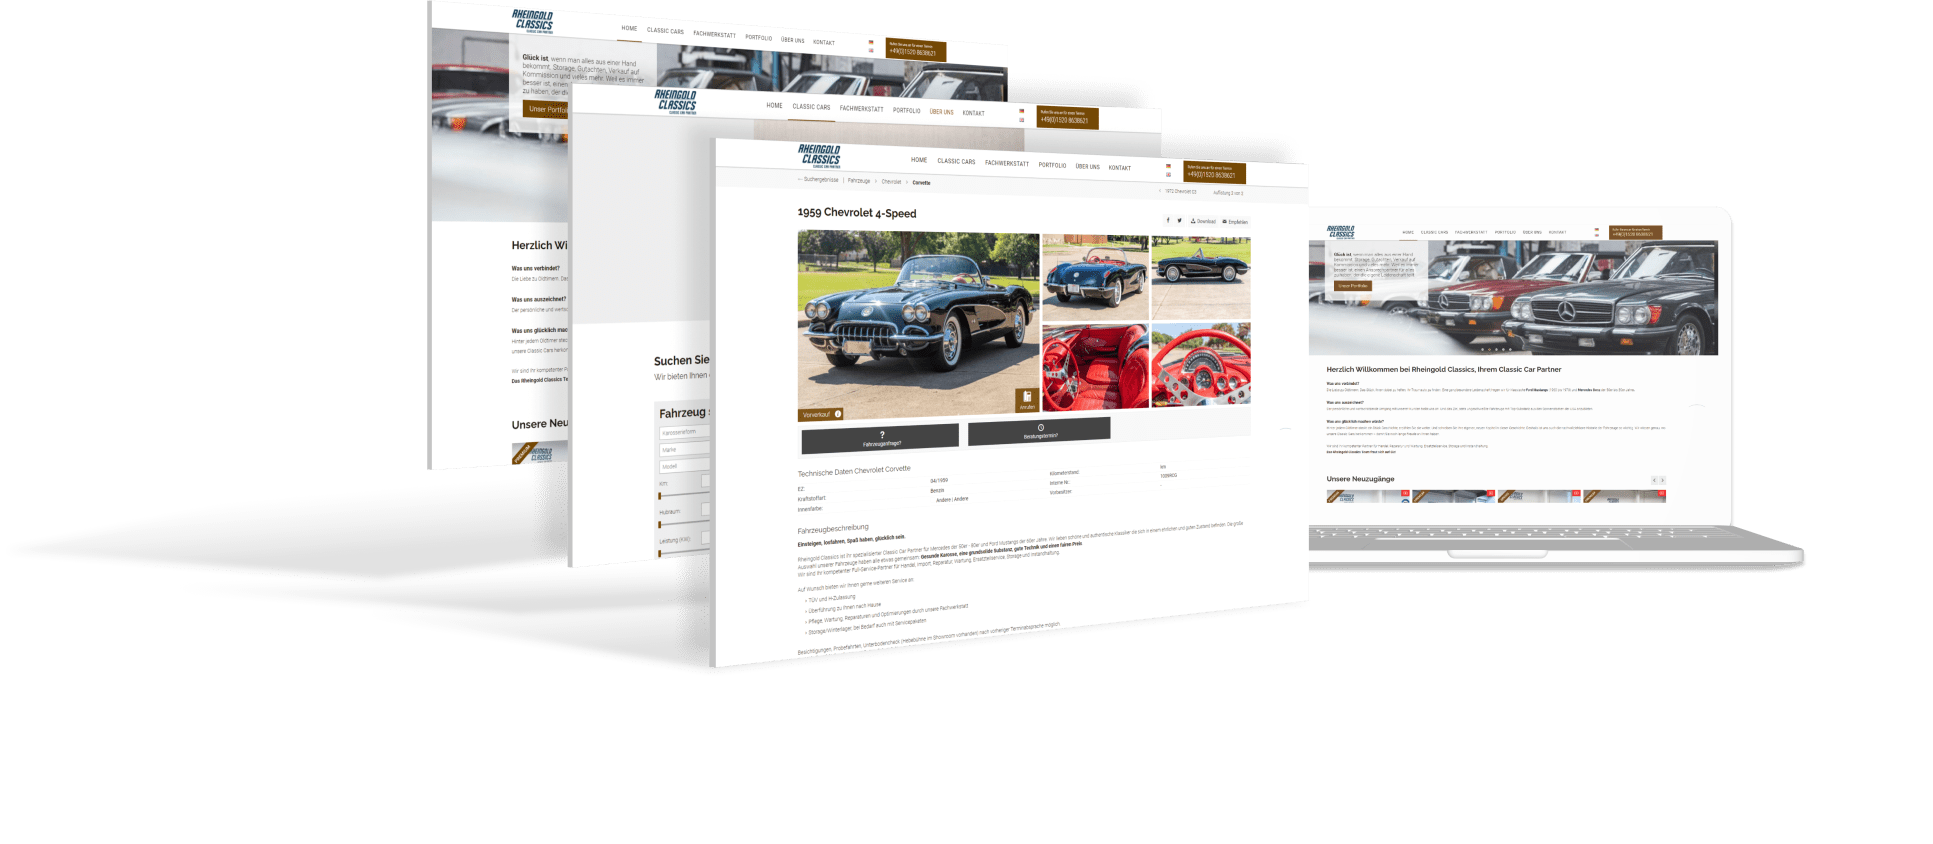 Rheingold Classics - Classic Car Partner in Rheinbreitbach